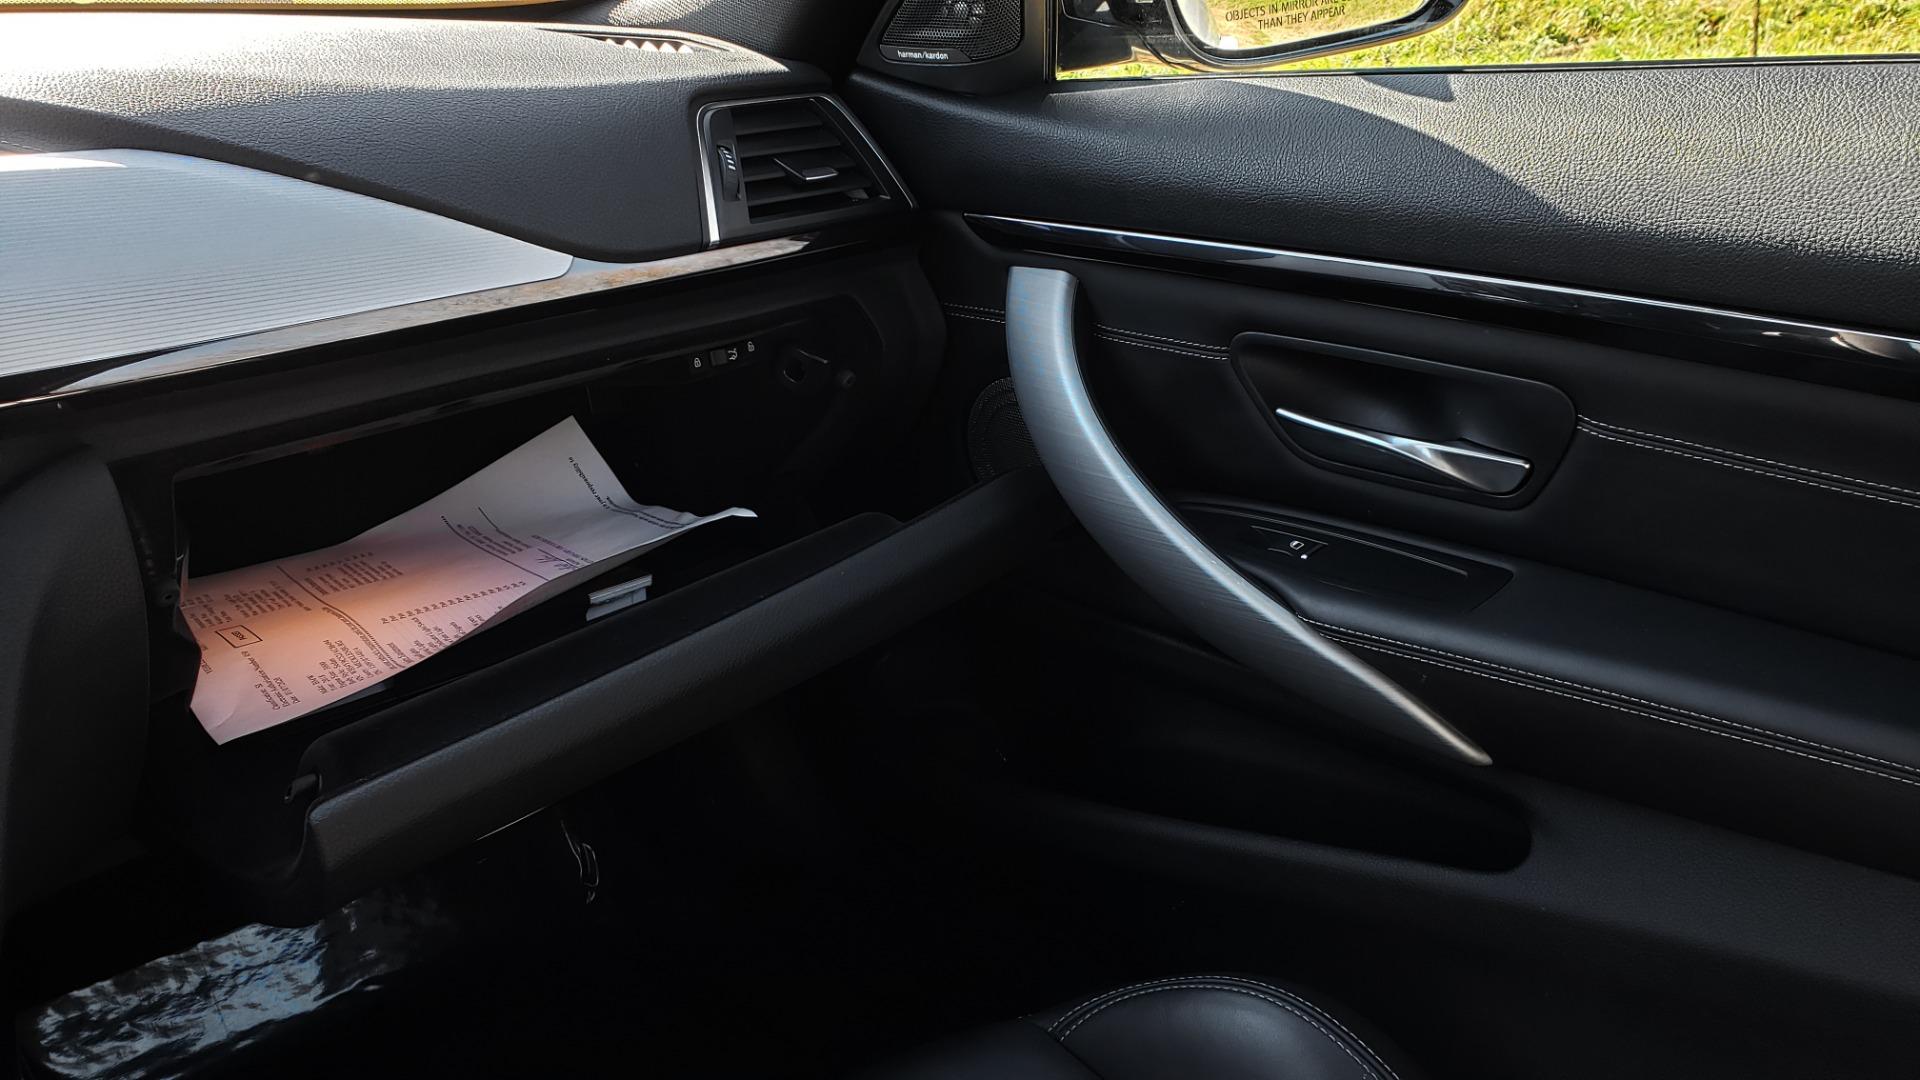 Used 2018 BMW M4 COMP PKG / EXEC / M-DRIVER / PARK CNTRL / ACTIVE BLIND SPOT for sale $45,449 at Formula Imports in Charlotte NC 28227 54